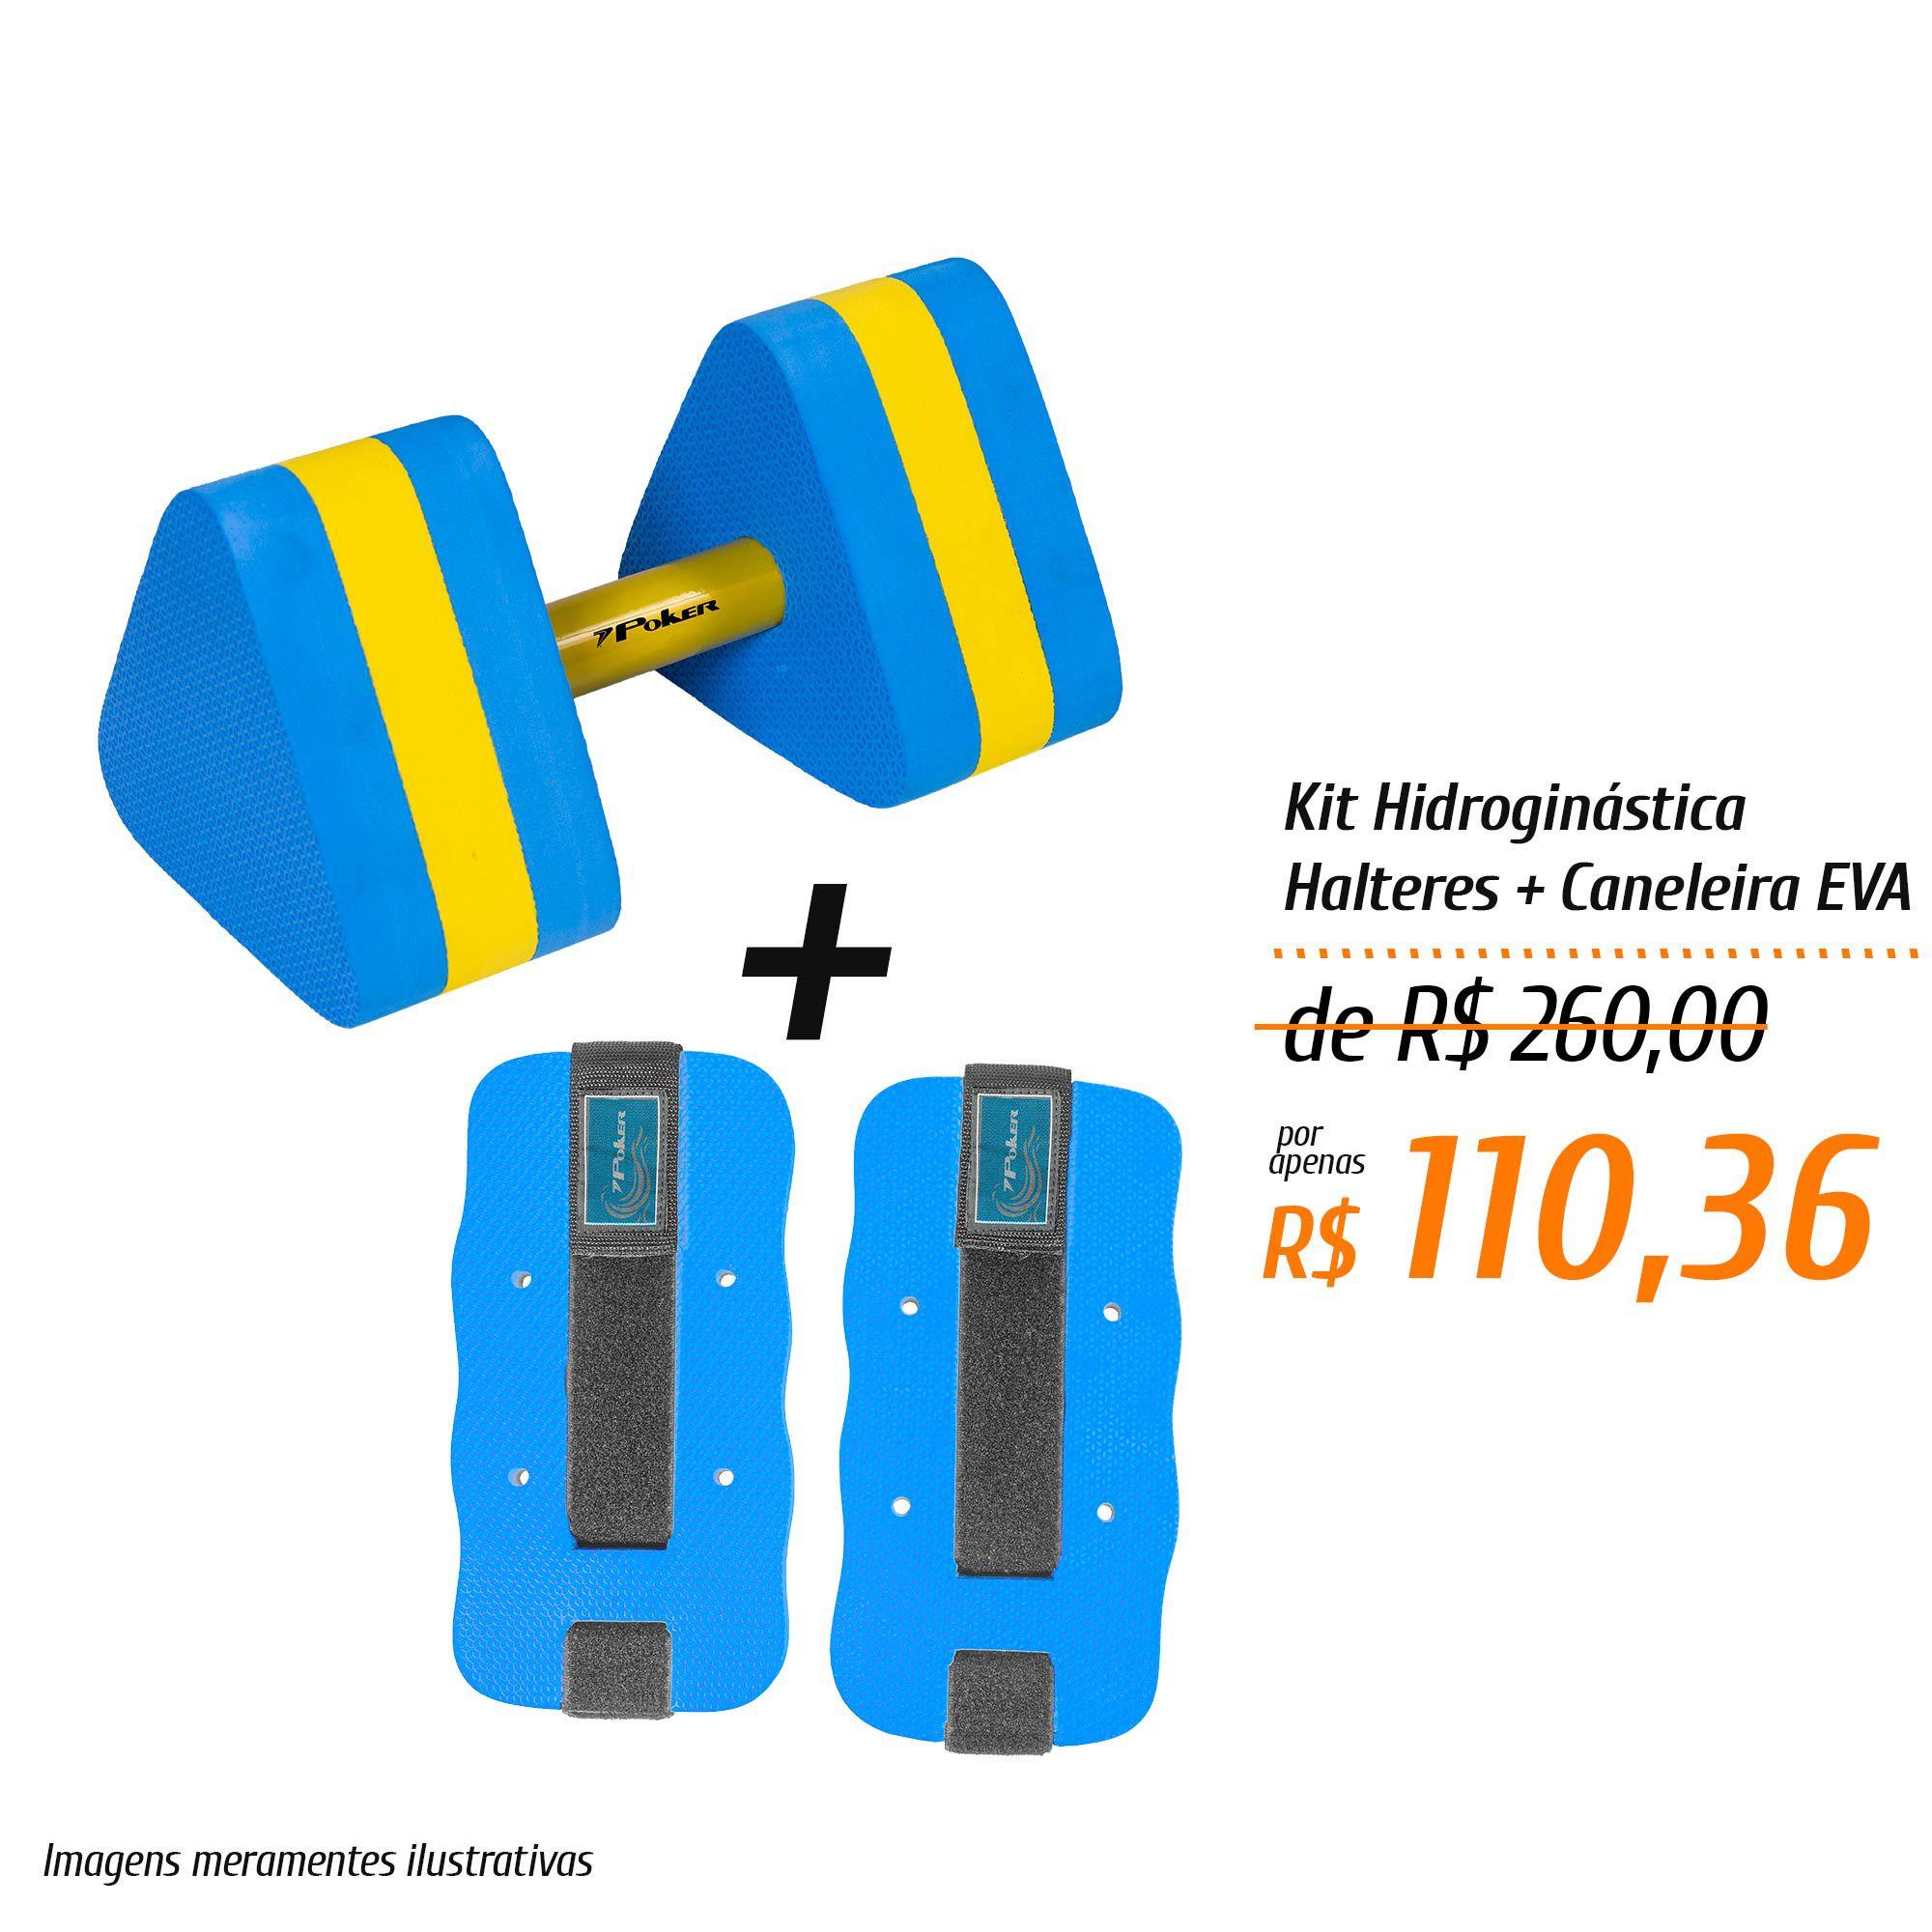 Kit Hidroginástica